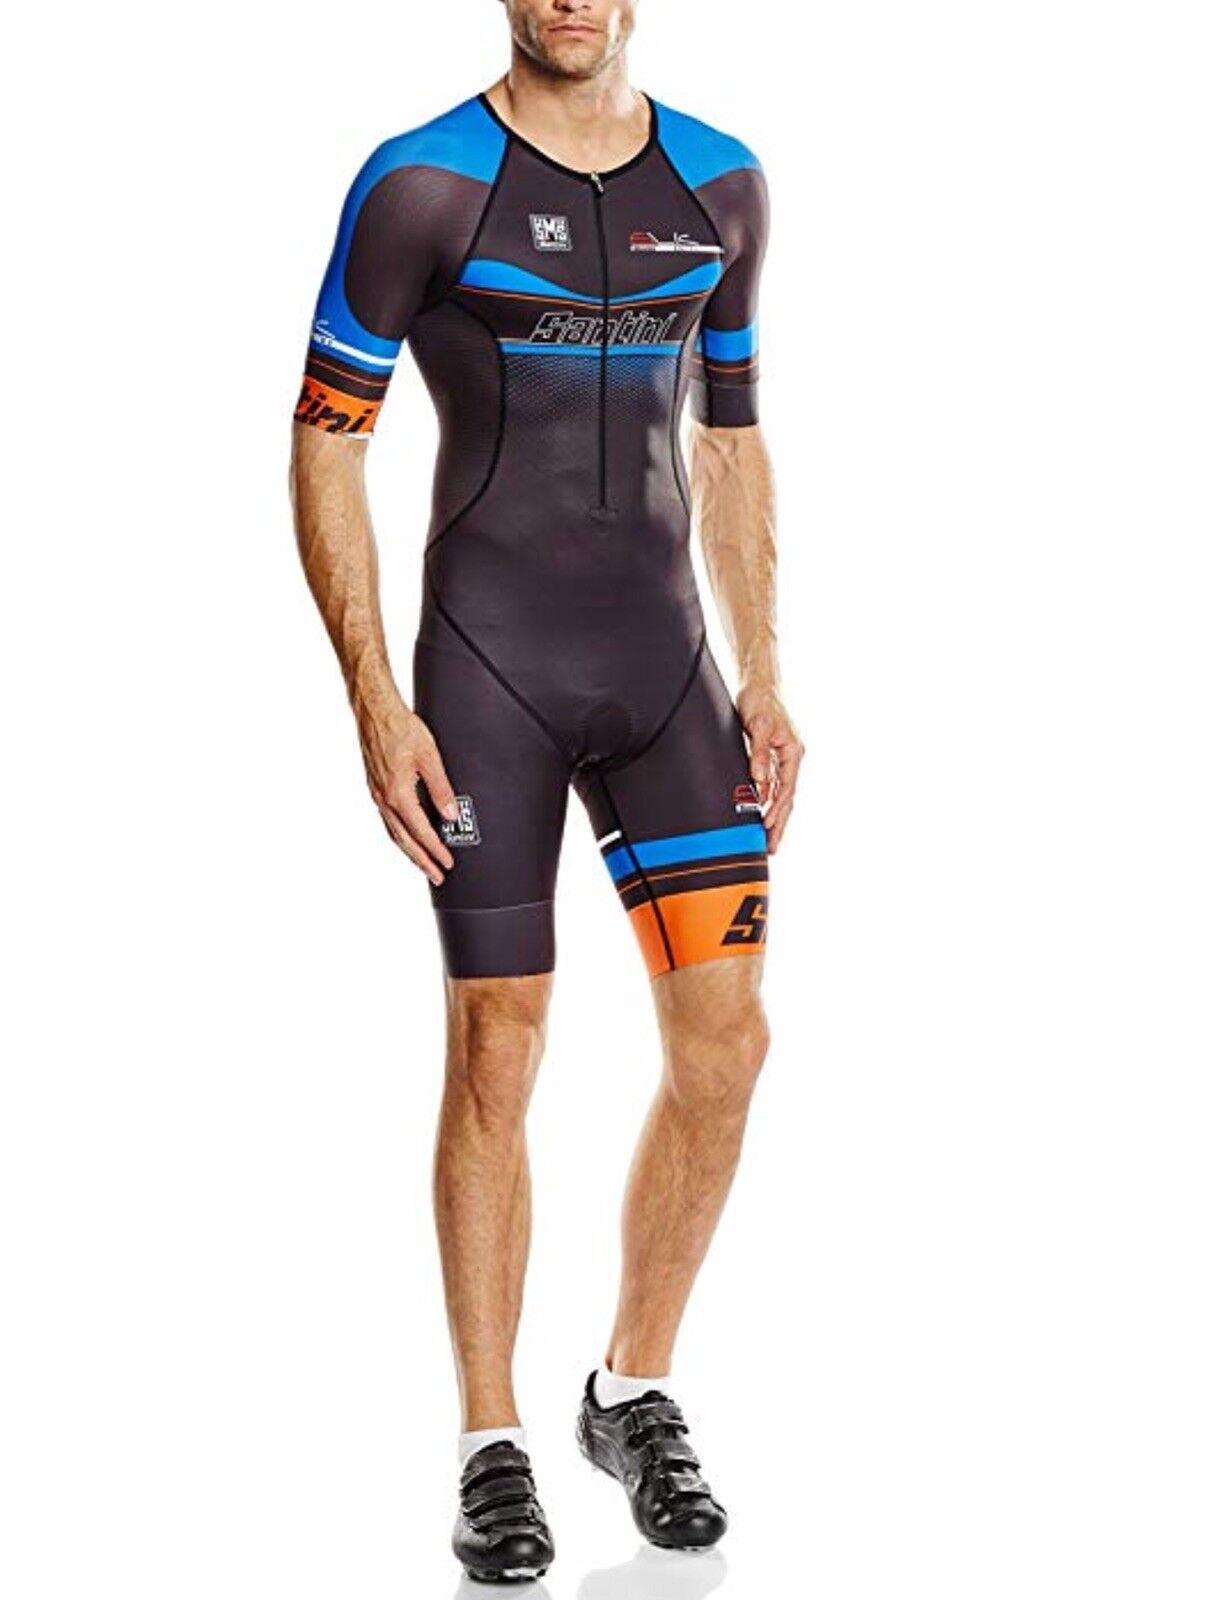 SANTINI SANTINI SANTINI elegante 2.0 Uomini Triathlon Body con taglio anatomico, Blu, XXL 5df268